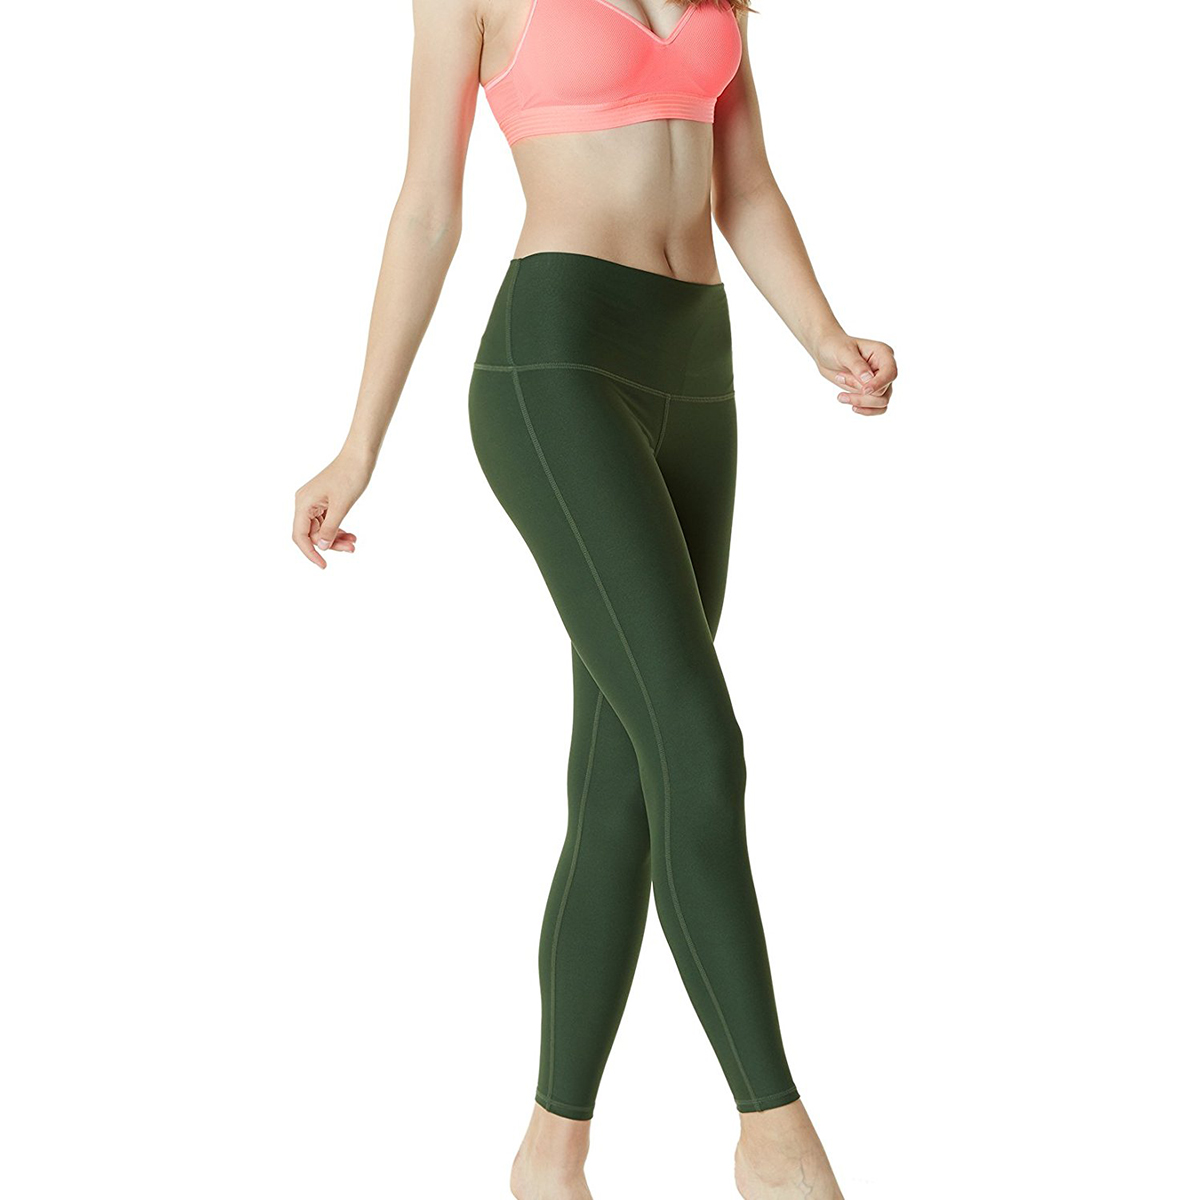 thumbnail 54 - TSLA Tesla FYP42 Women's High-Waisted Ultra-Stretch Tummy Control Yoga Pants